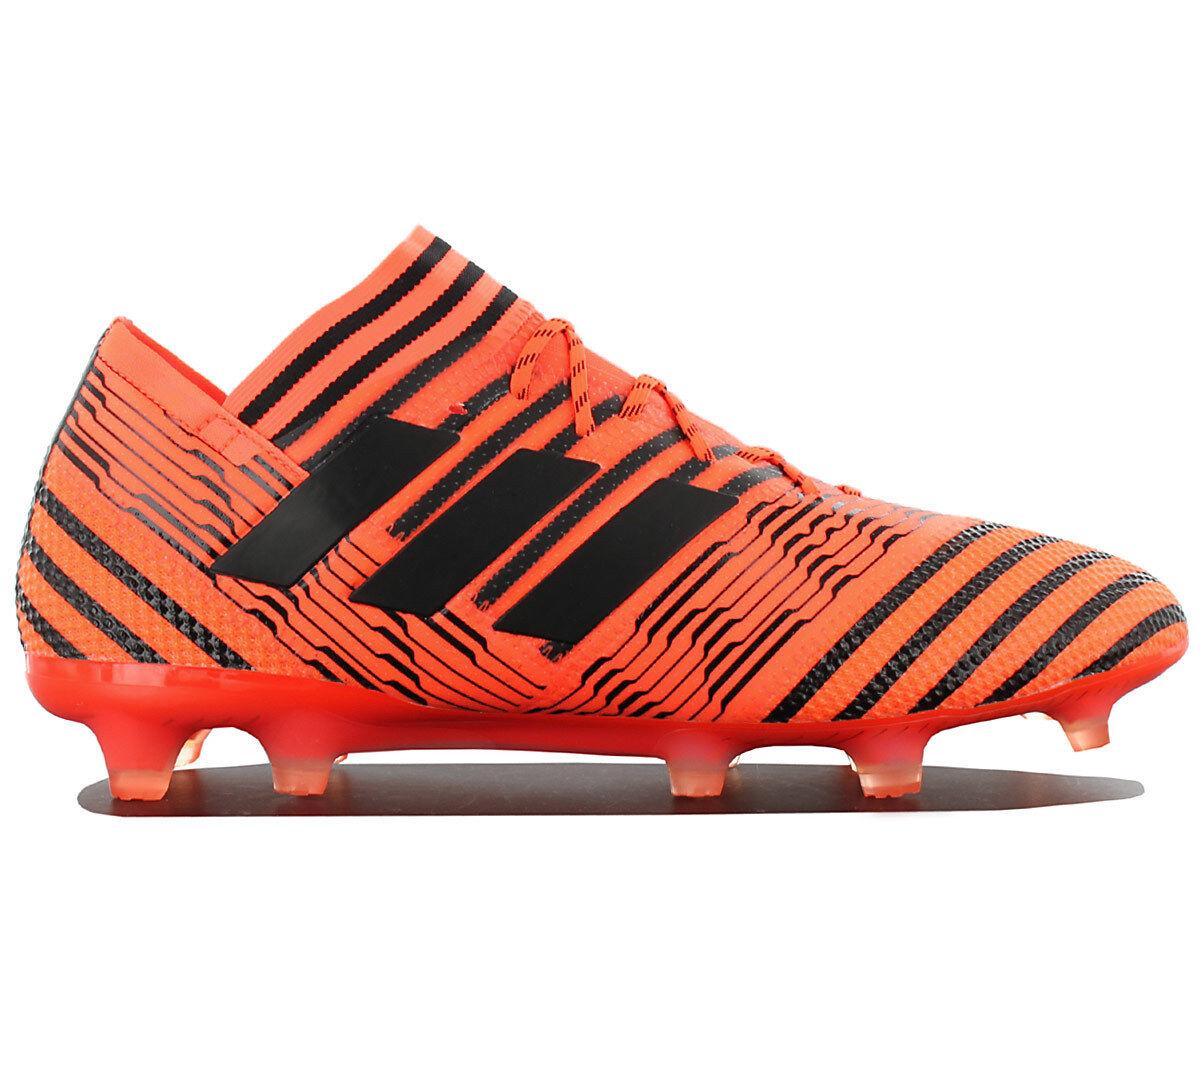 Adidas nemeziz 17.1 FG  Pyro Storm  señores levas botas de fútbol Ace bb6079 nuevo